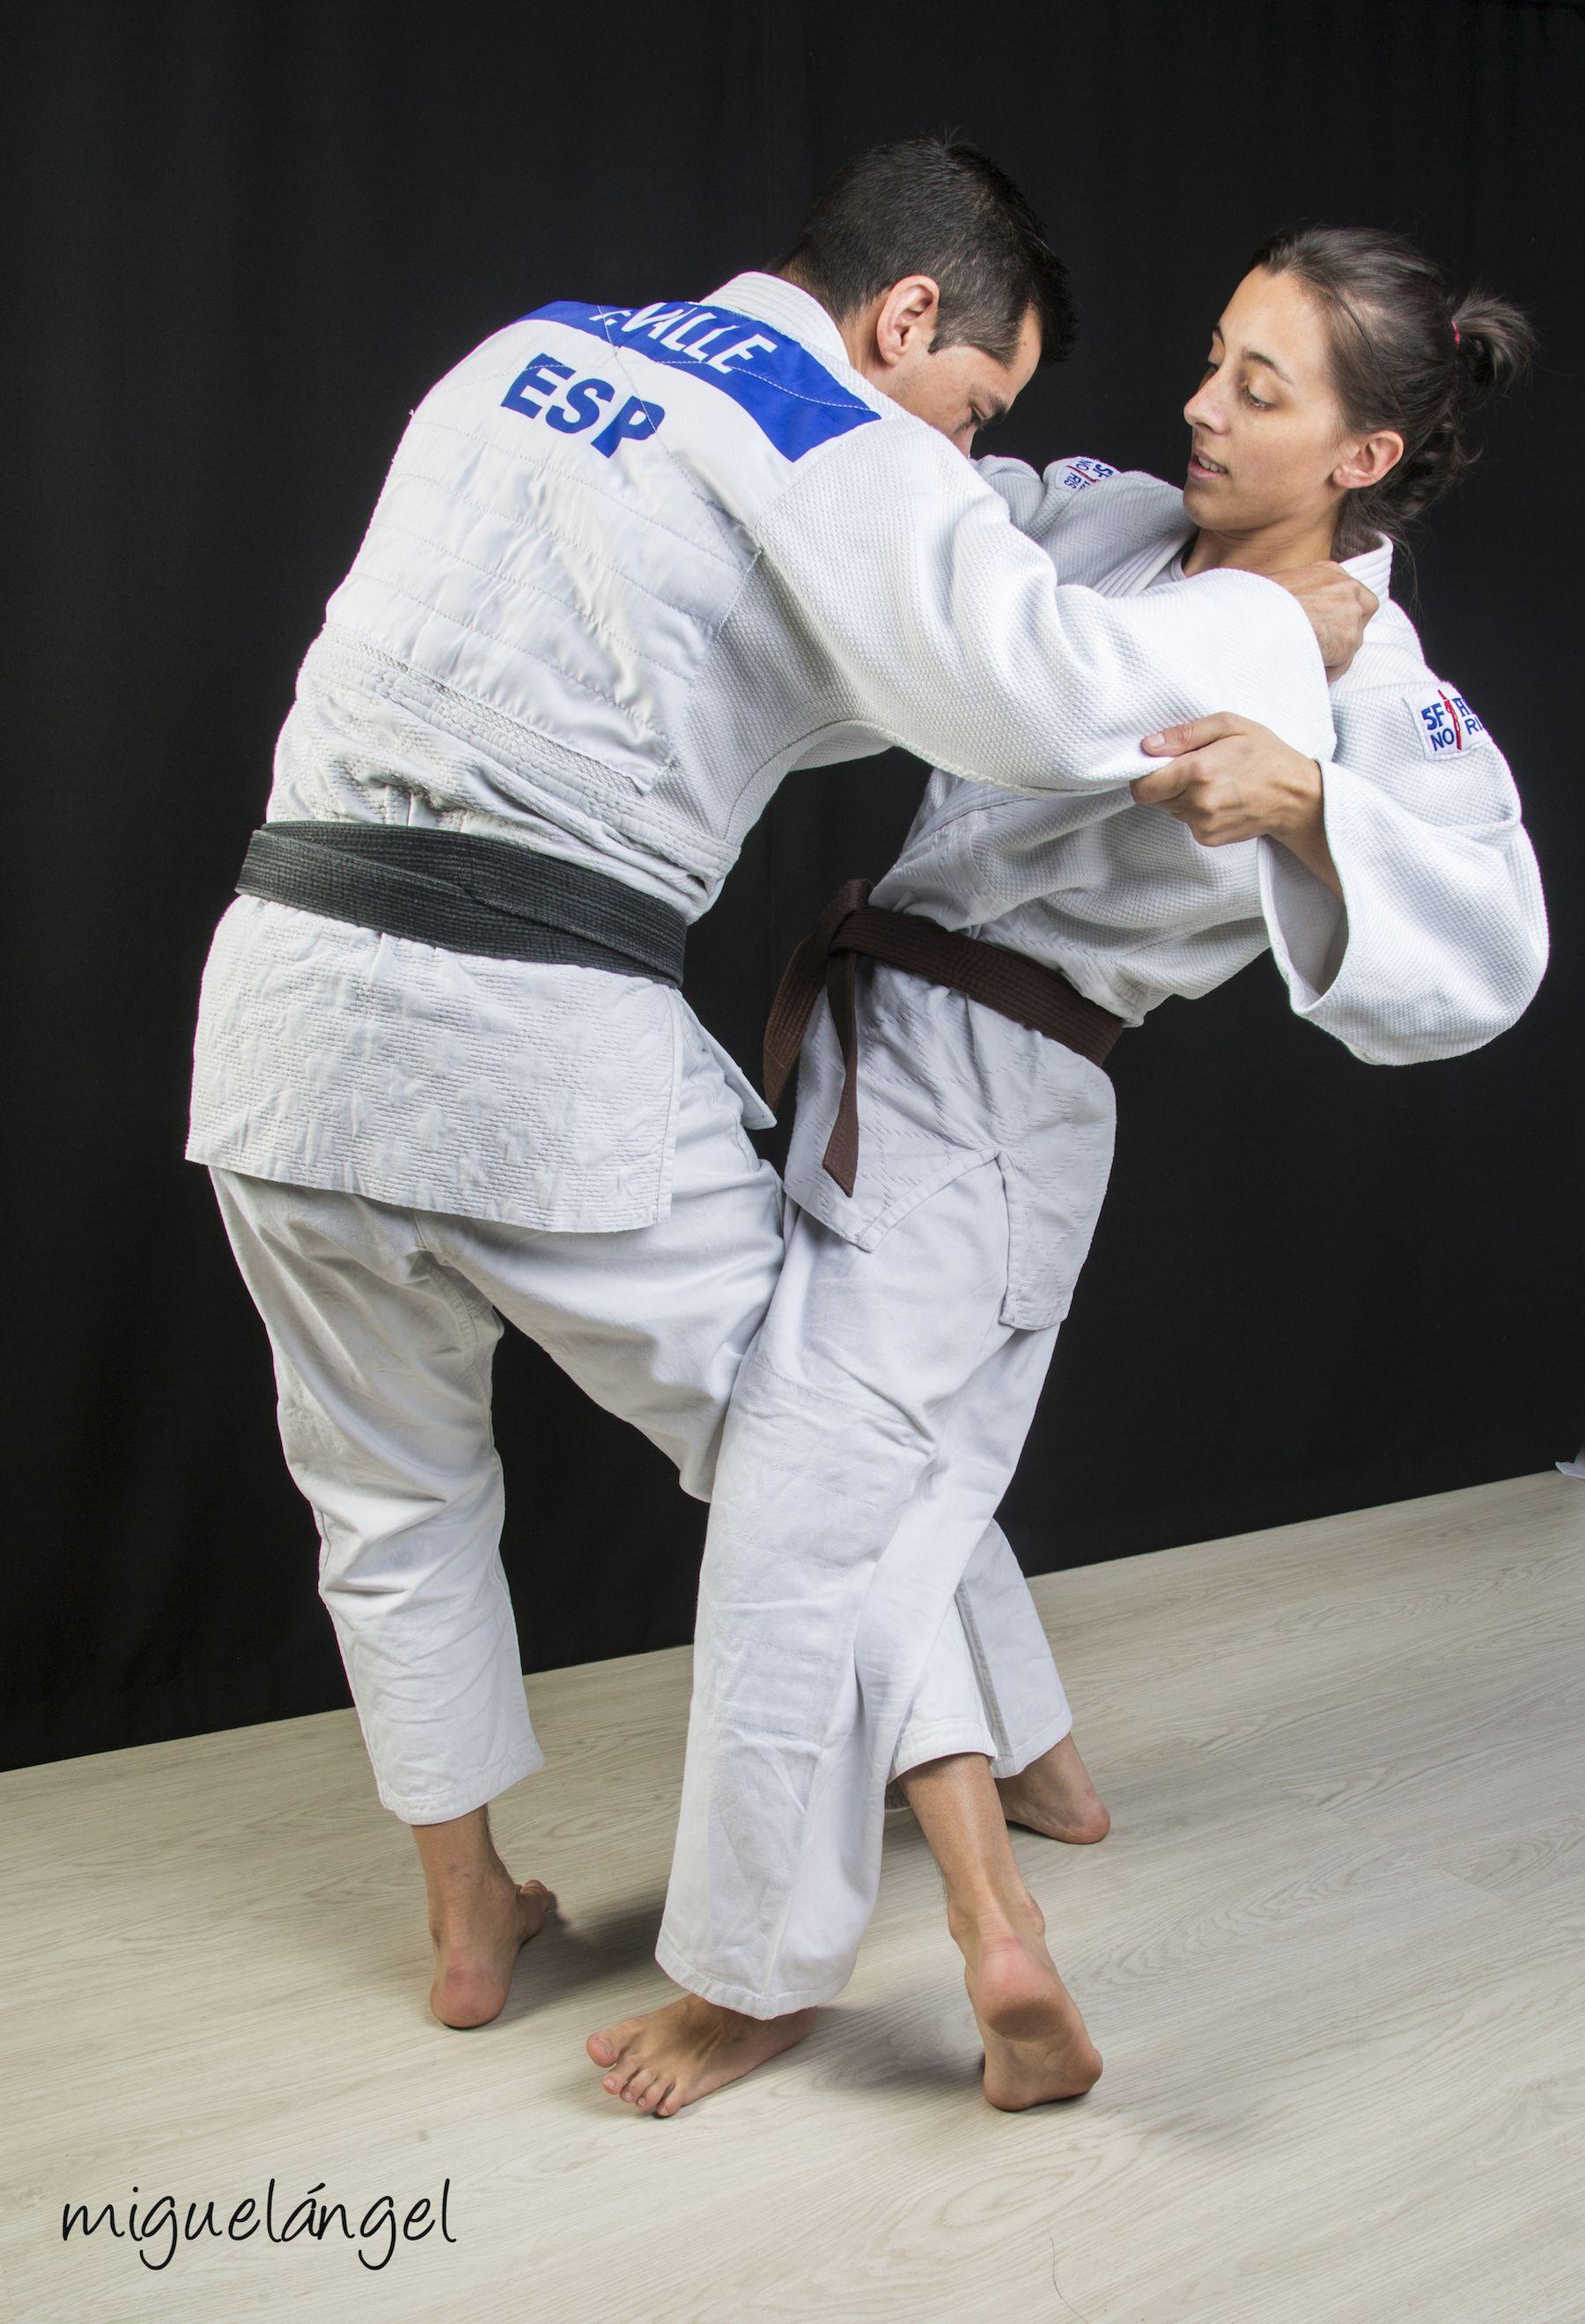 Pin de ShihanLee en Girls and Martial arts   Artes